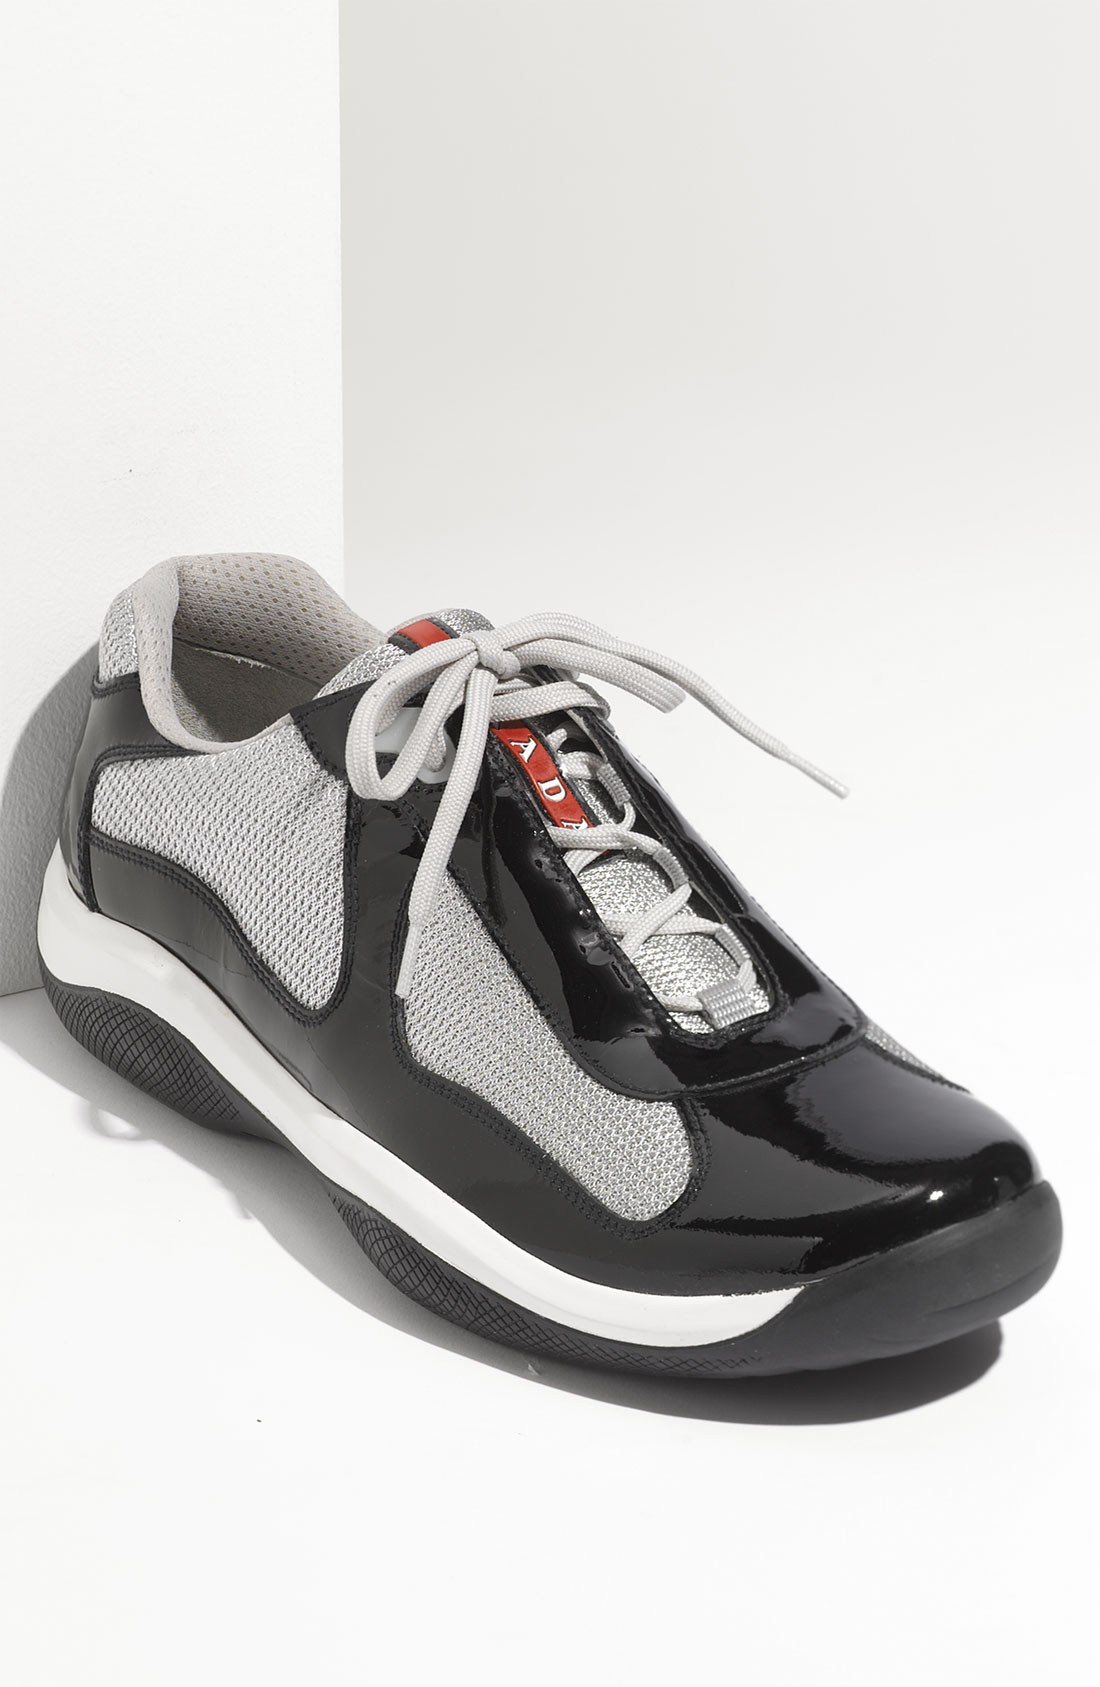 Prada Shoes Men Lyst